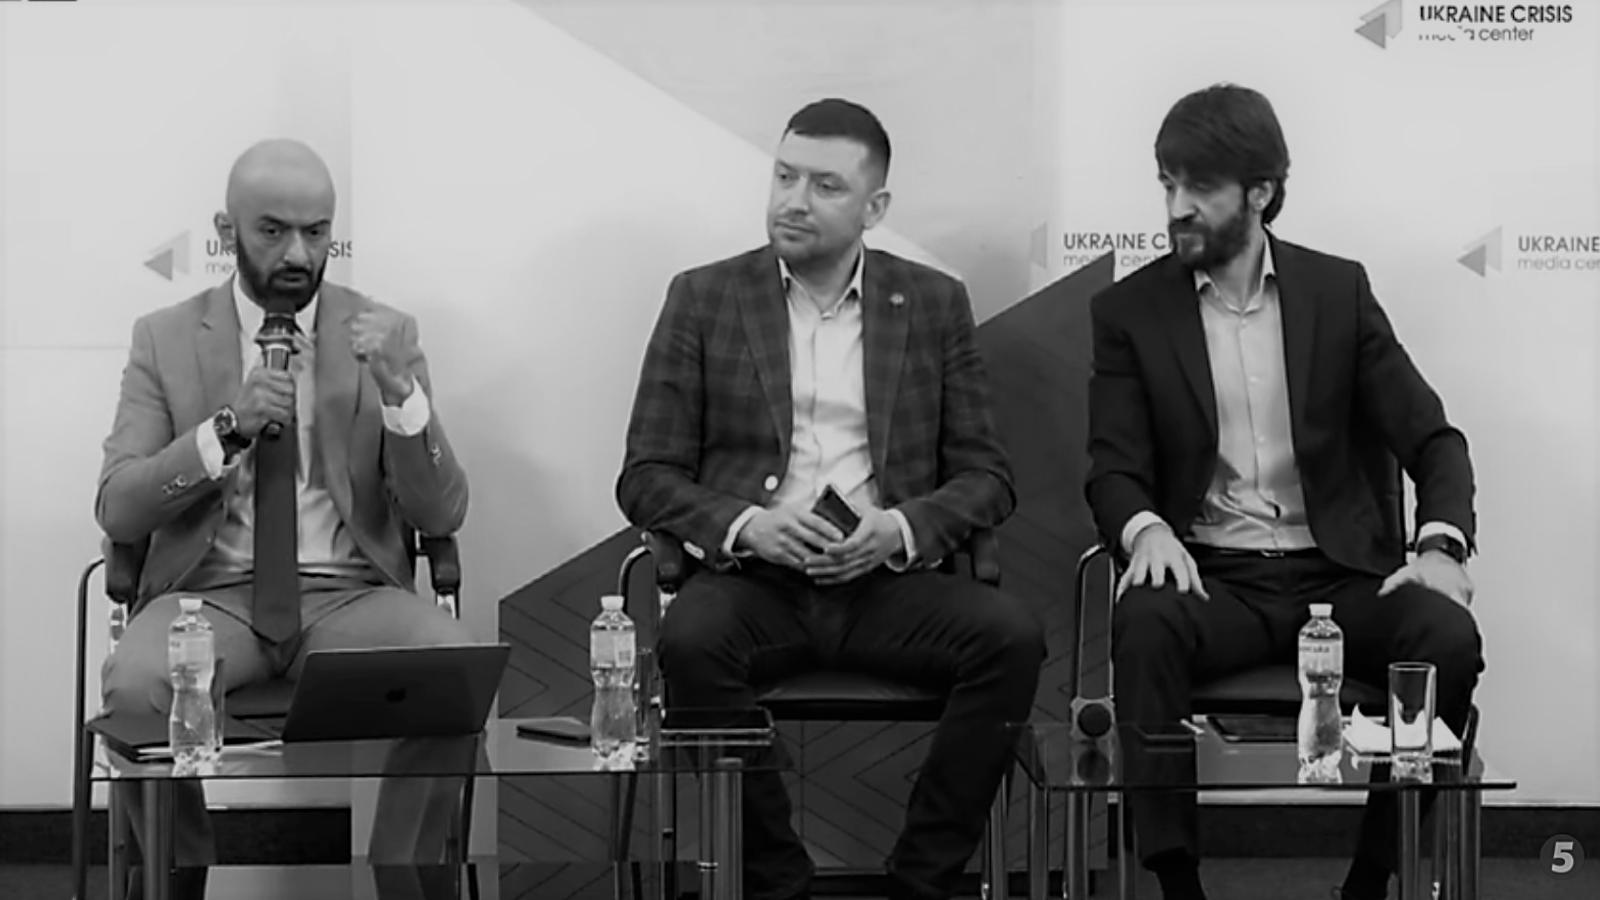 Скриншот видео брифинга адвокатов Сергея Стерненко